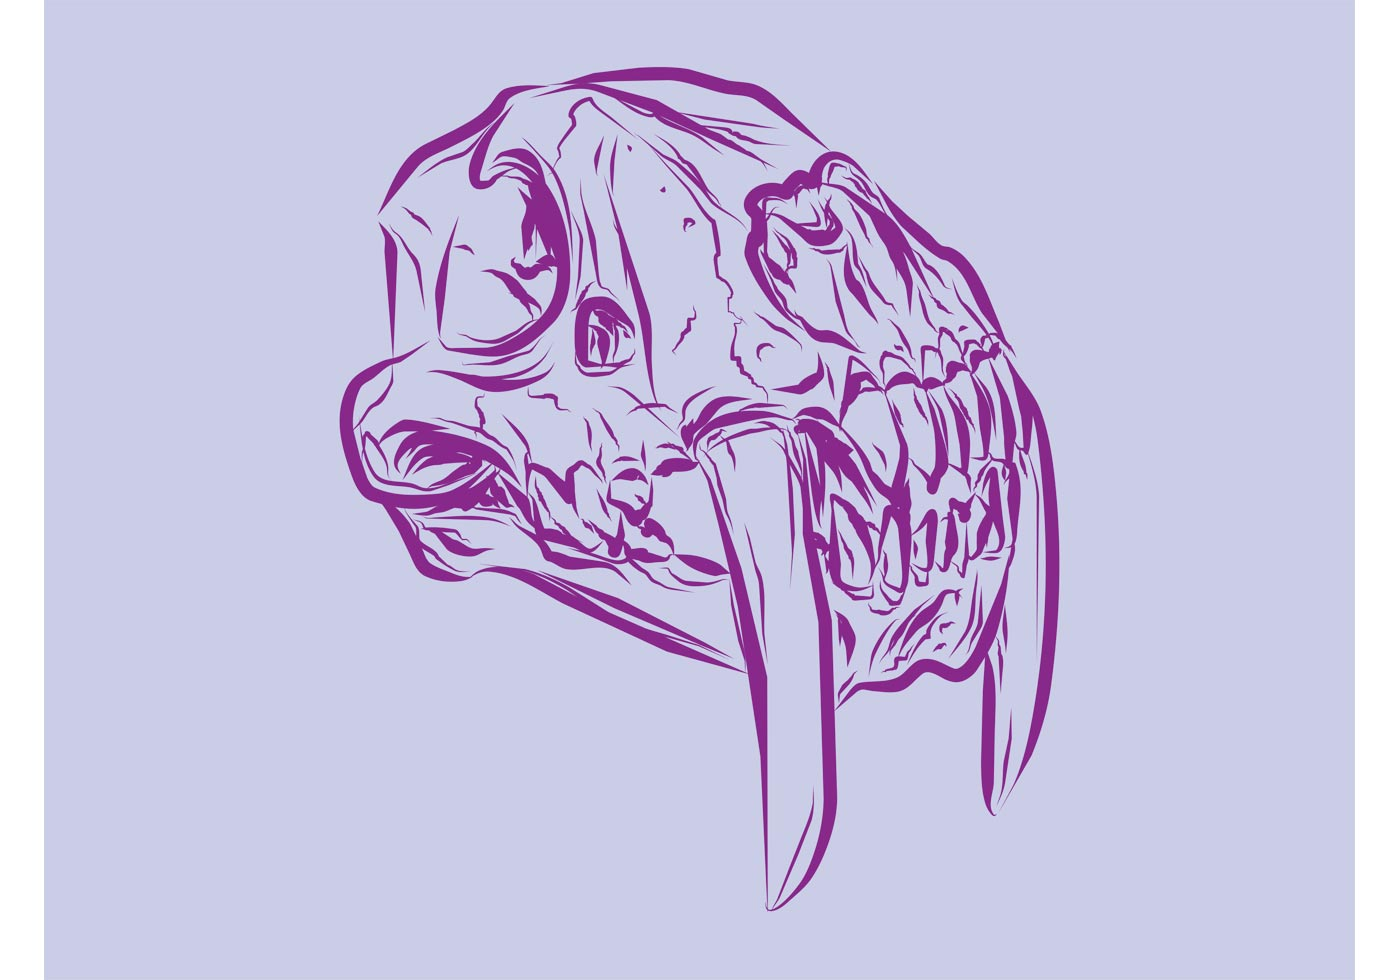 Cute Dia De Los Muertos Wallpaper Animal Skull Vector Download Free Vector Art Stock